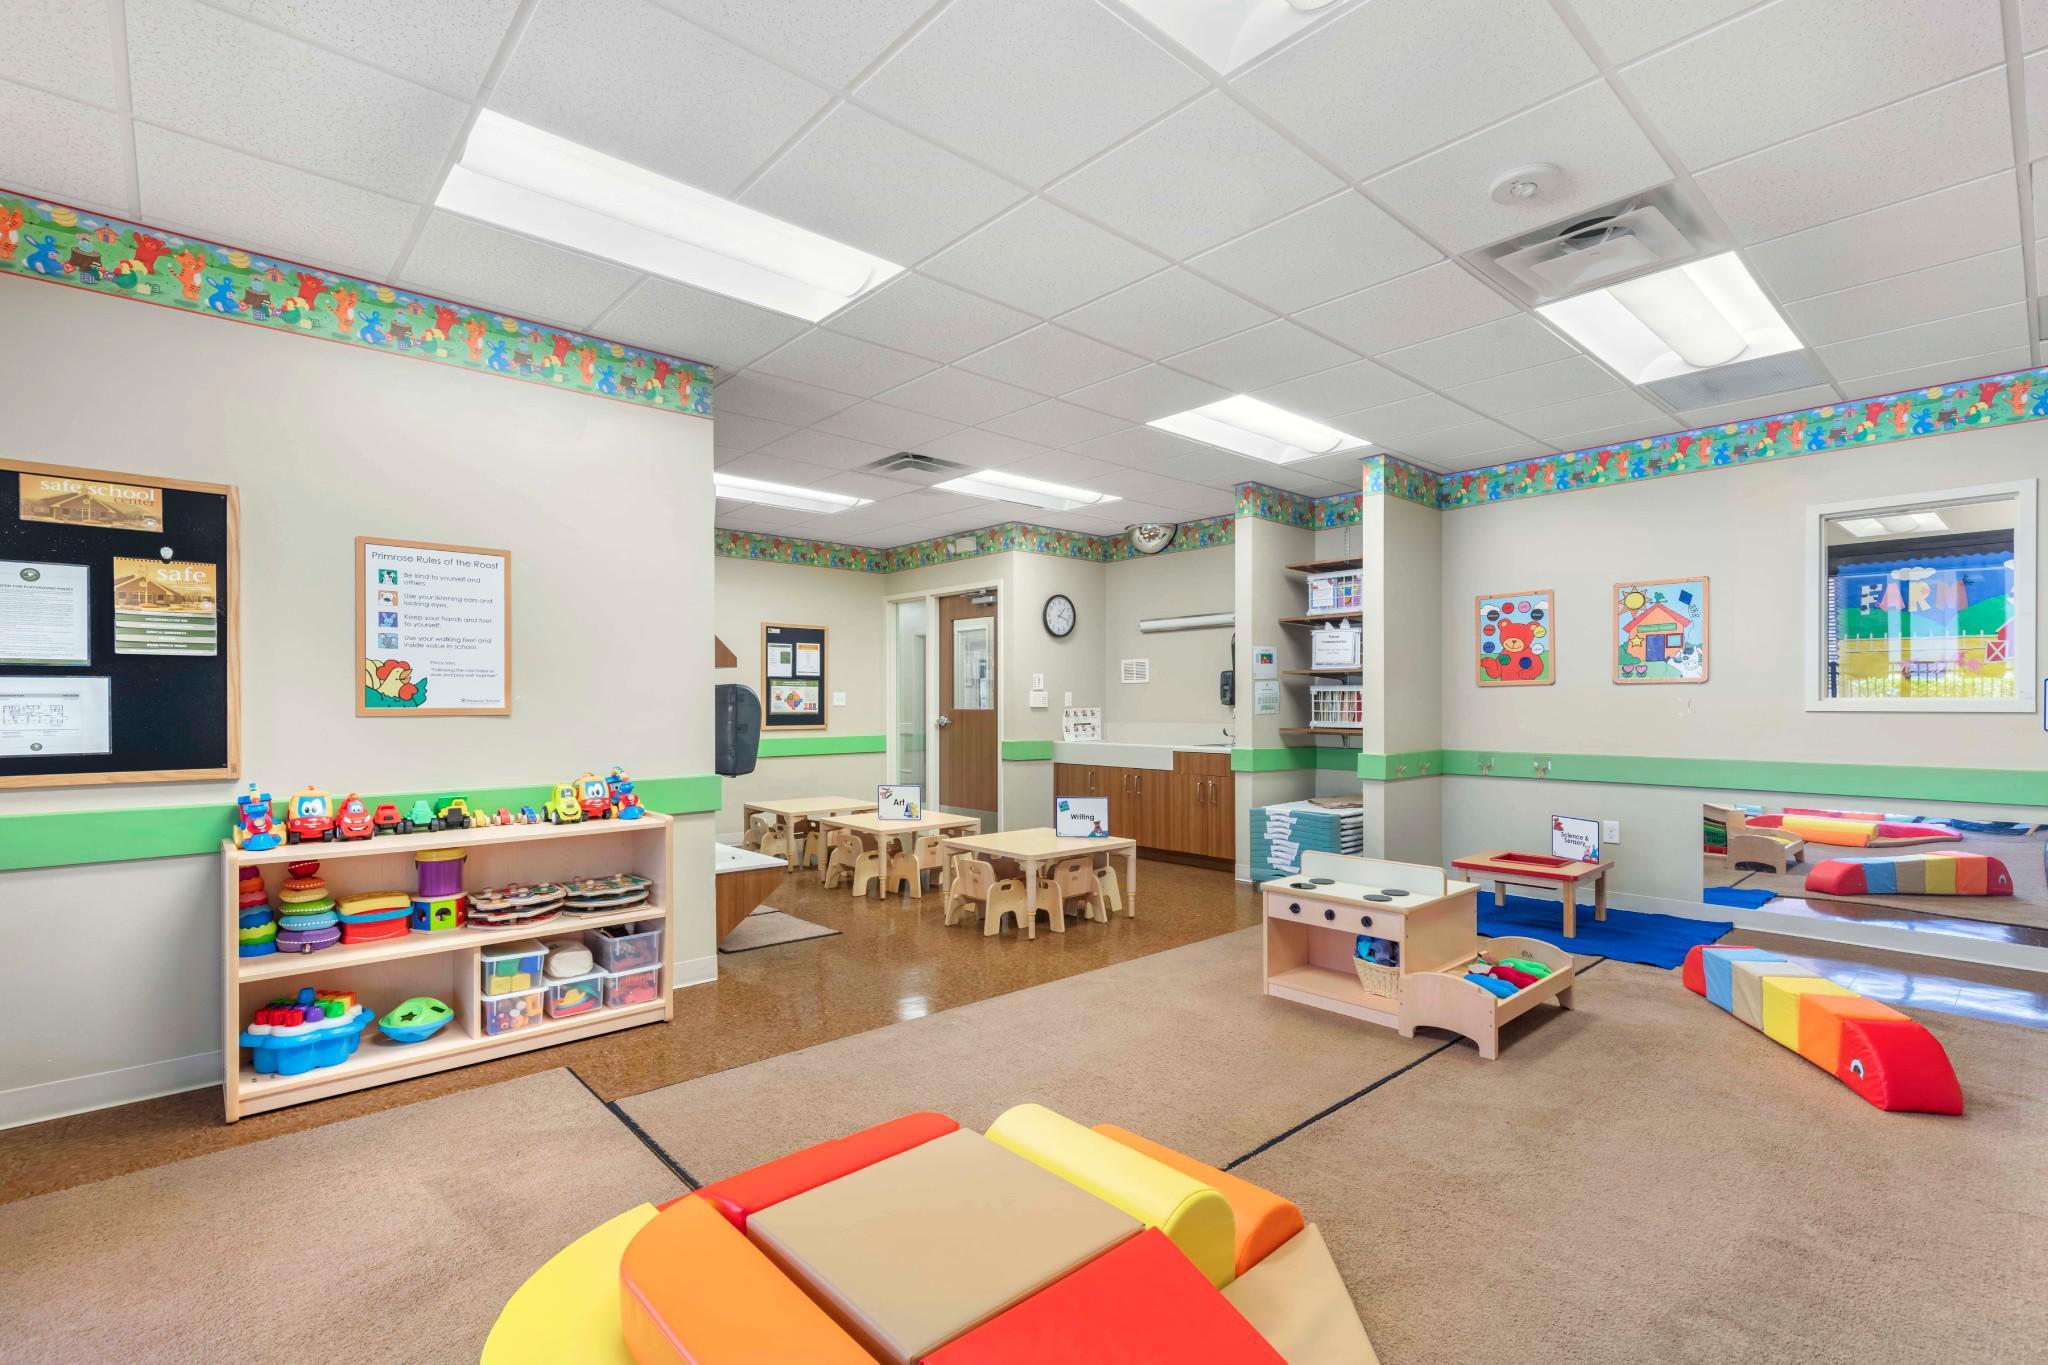 Primrose School of Preston Hollow image 46